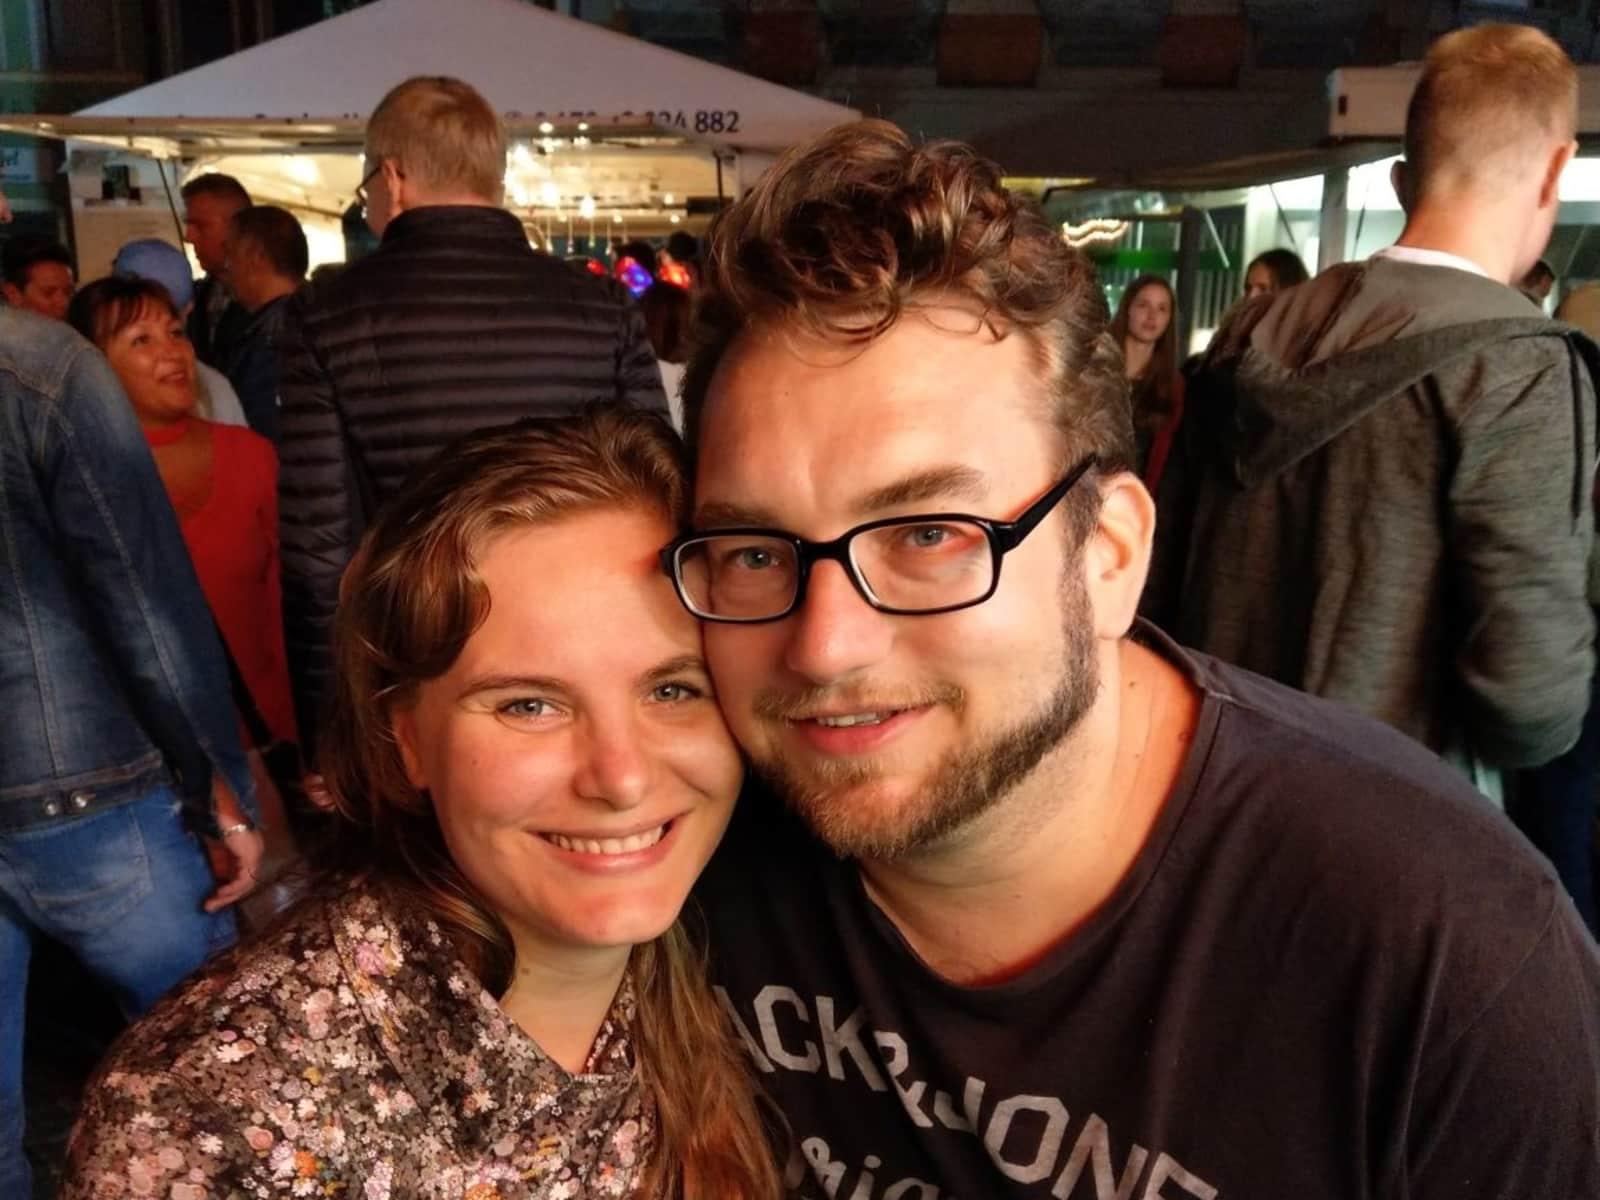 Christina & Frank from Helmstedt, Germany